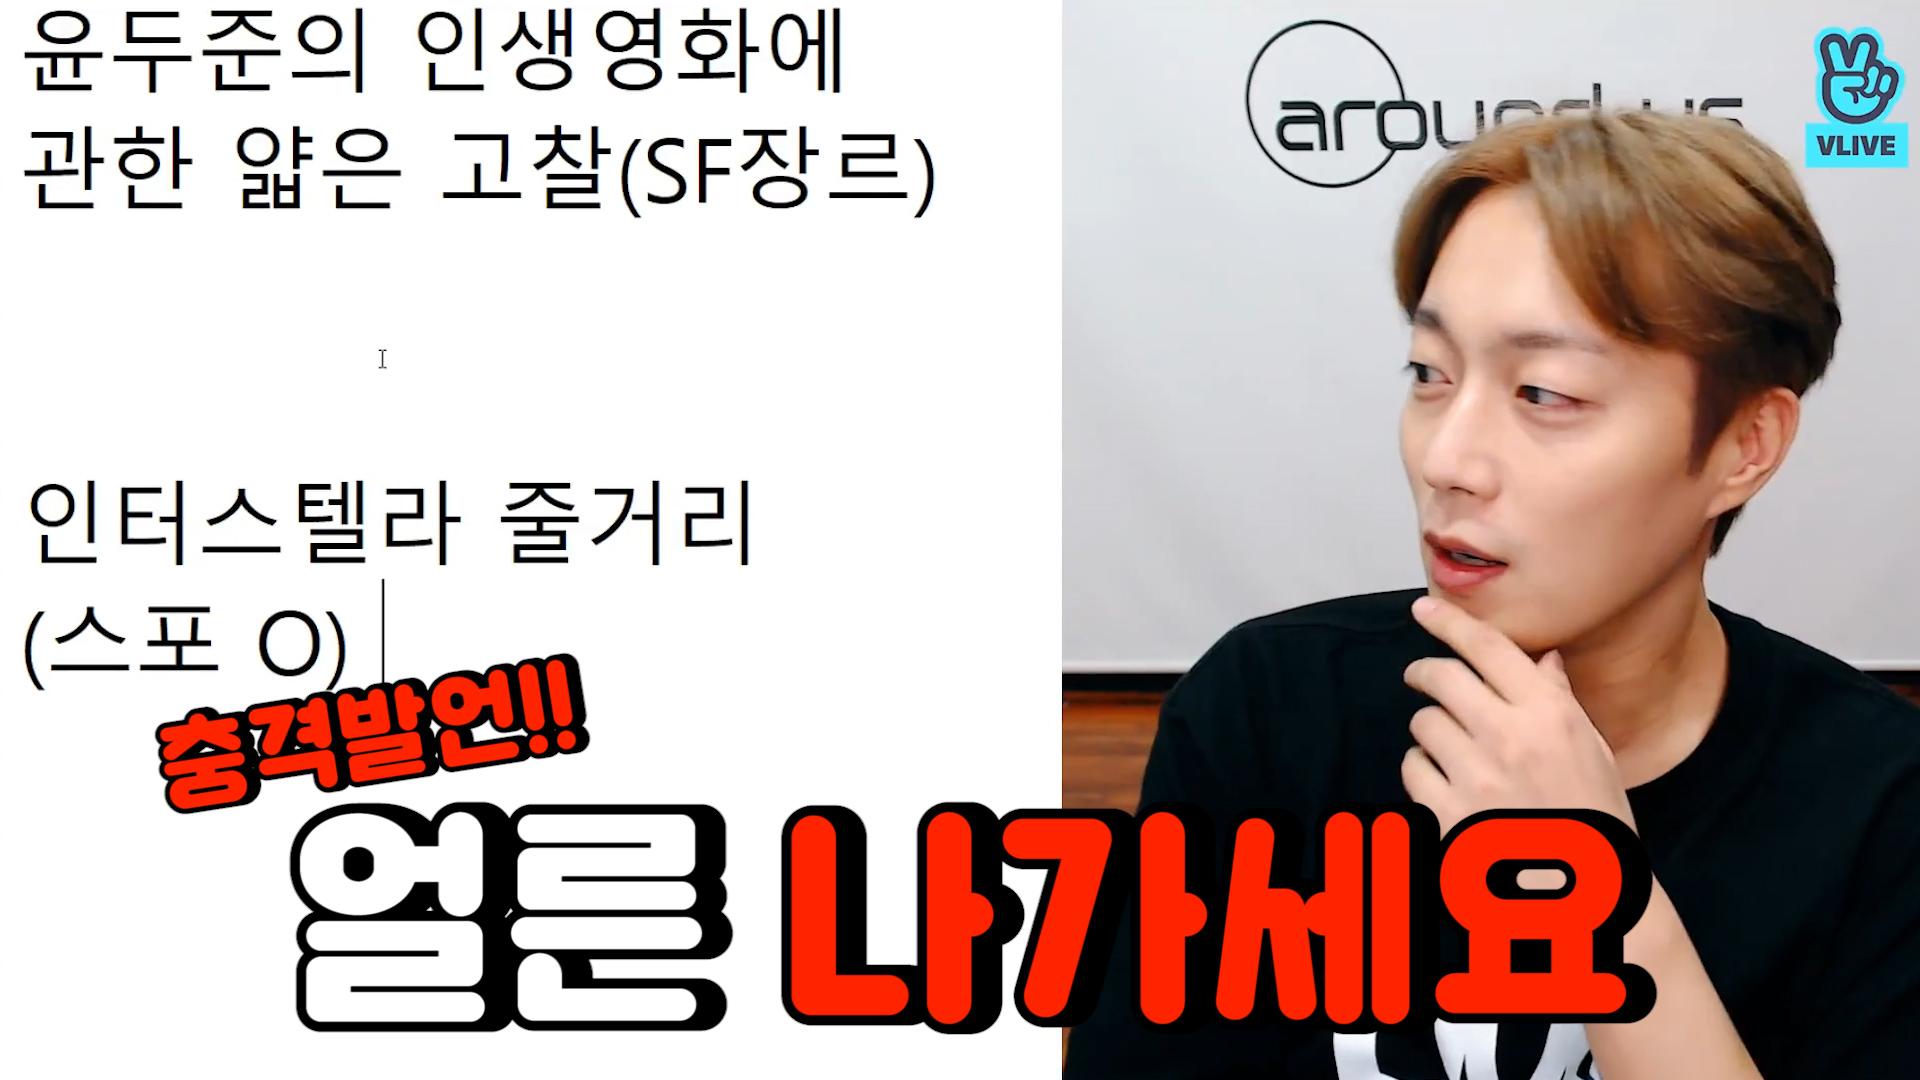 [HIGHLIGHT] 🎬세계최초 시청자 내보내는 브이앱(a.k.a 꿀교양) (DUJUN talking about his favorite movie)